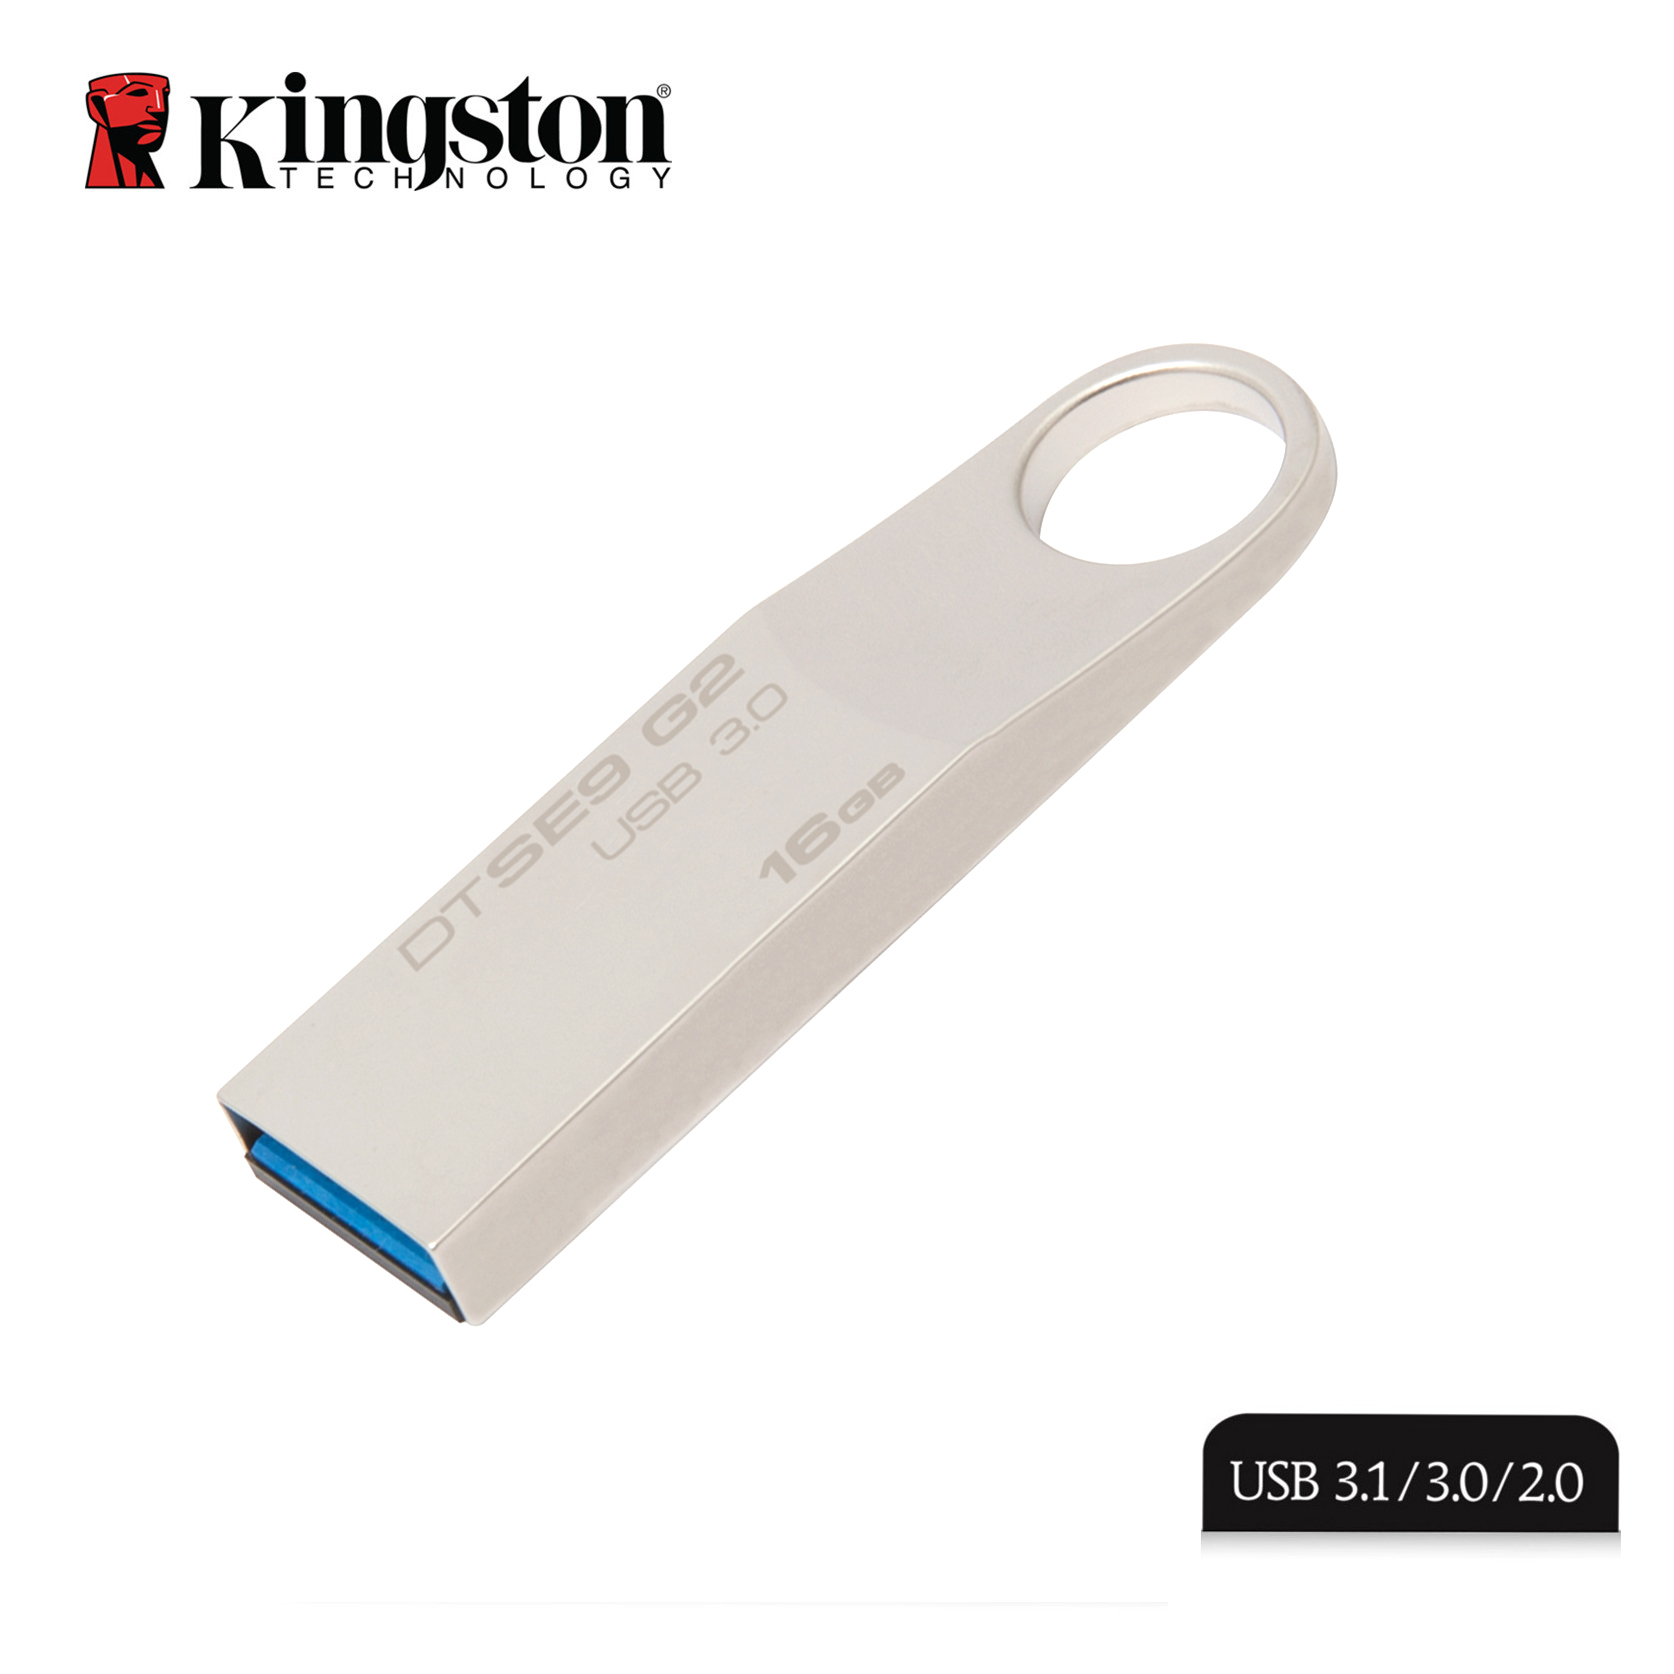 kingston 16gb usb flash drive 3 0 metal casing usd drive. Black Bedroom Furniture Sets. Home Design Ideas